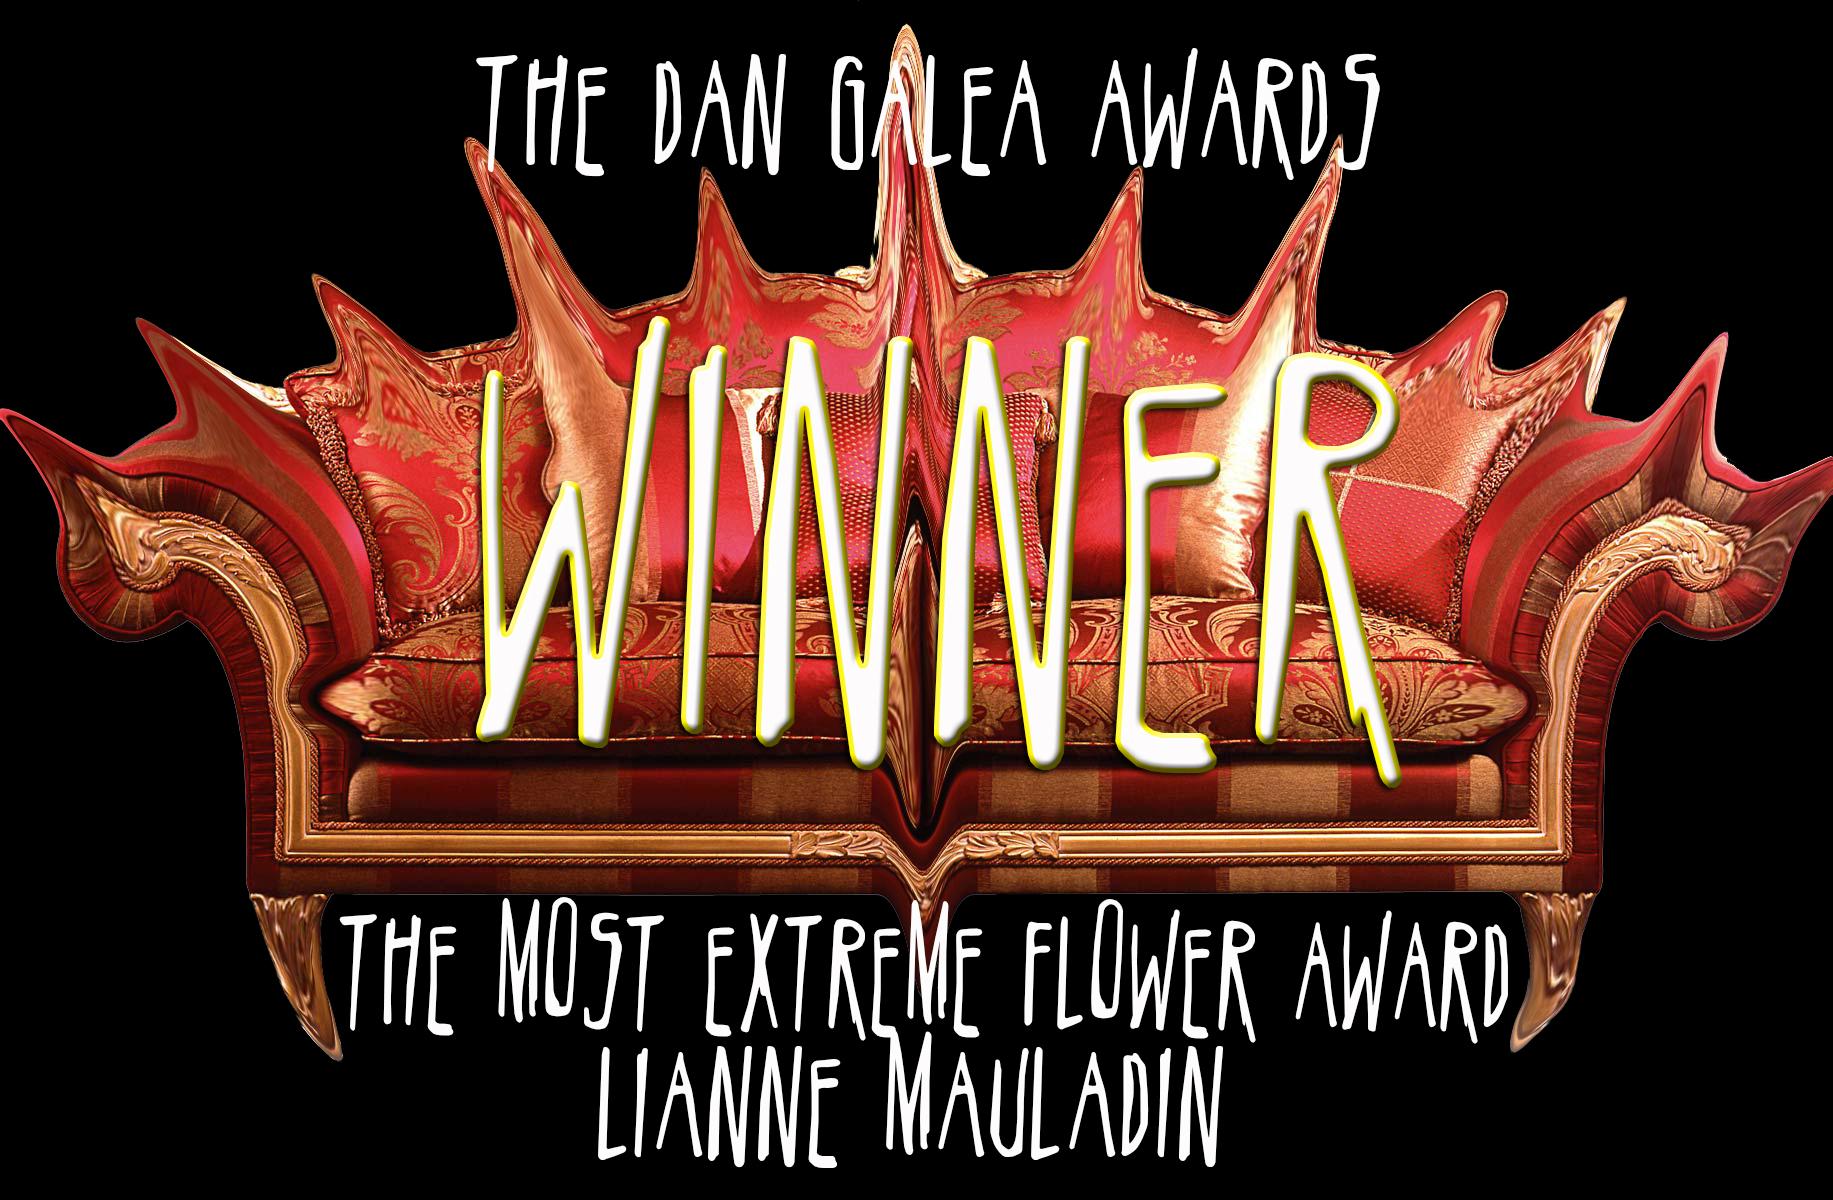 DGawards Lianne Mauladin.jpg